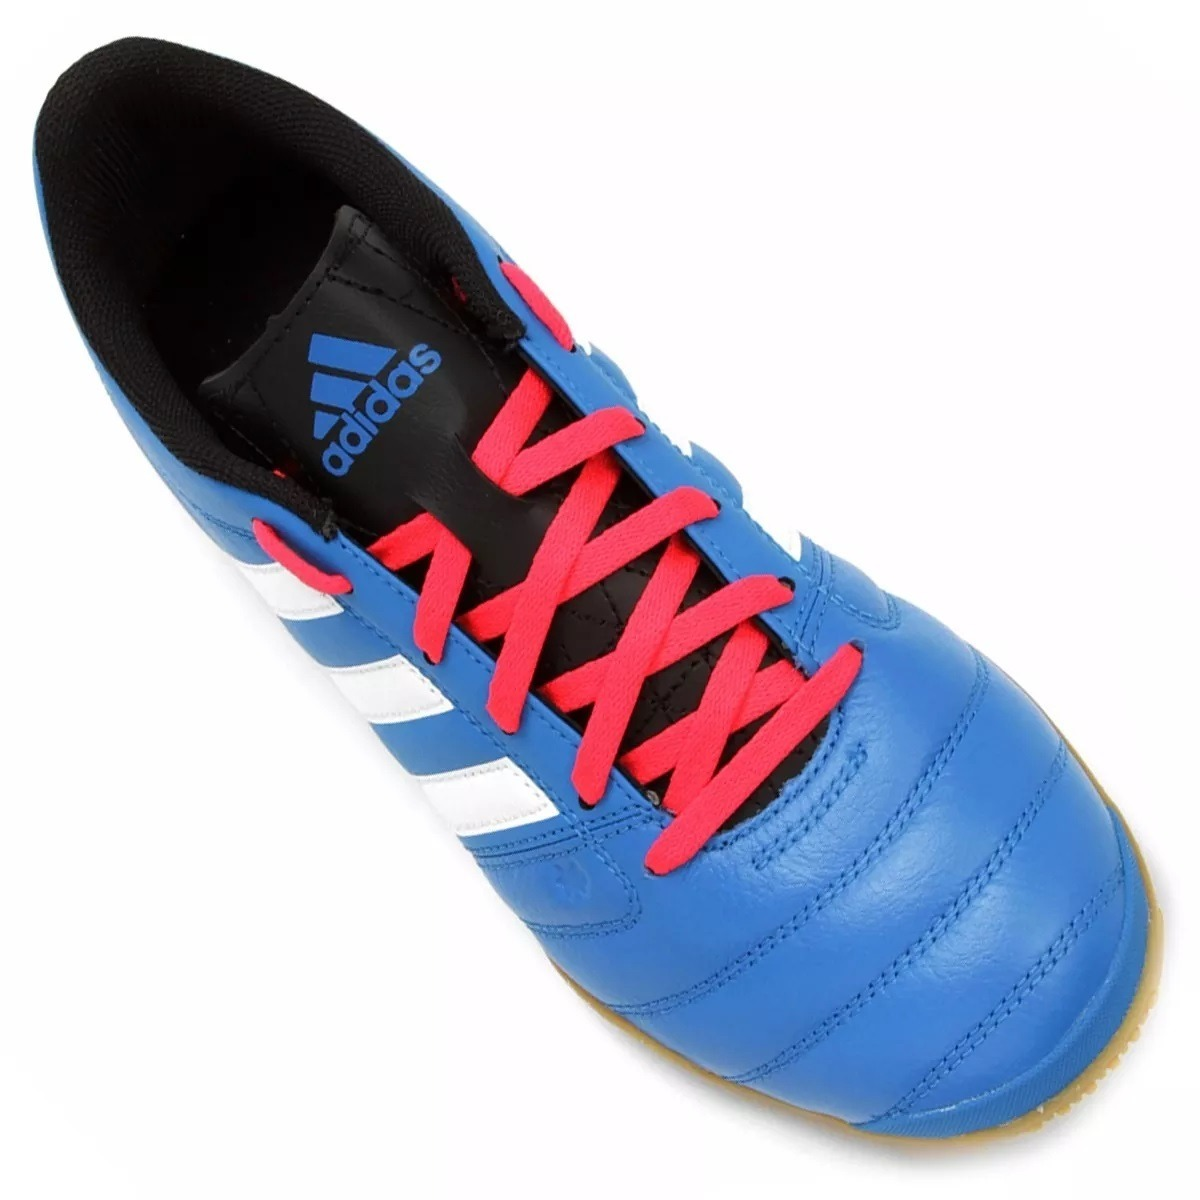 d2cac4d7f1 chuteira adidas gloro 16.2 - futsal - original. Carregando zoom.